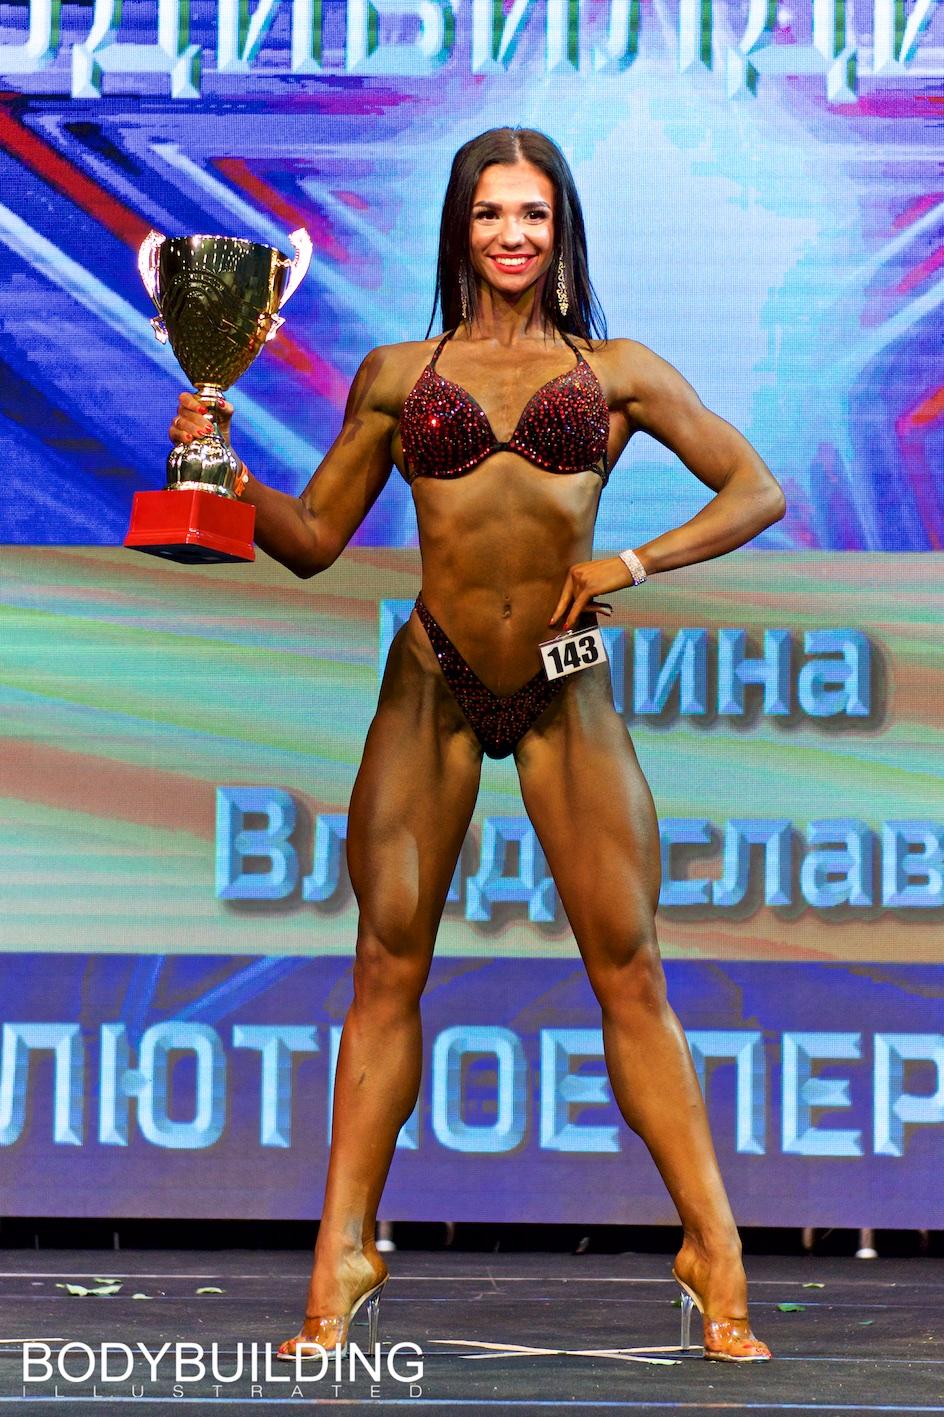 Панина Владислава Кубок Москвы по бодибилдингу 2019 фитнес-бикини